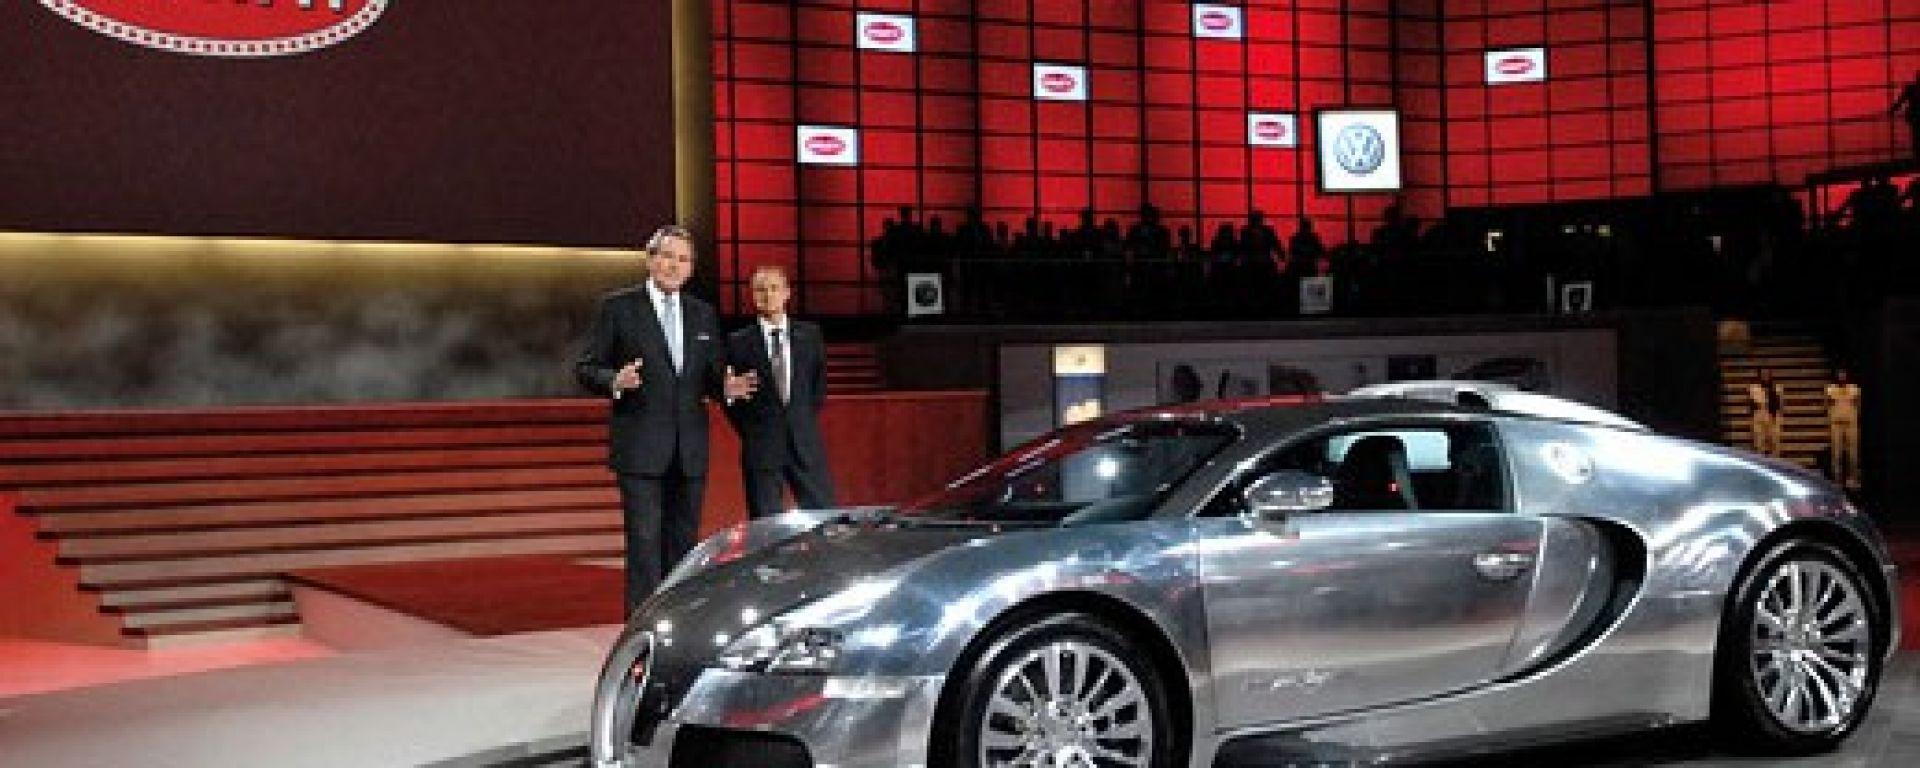 Bugatti EB 16.4 Veyron Pur Sang (gallery)